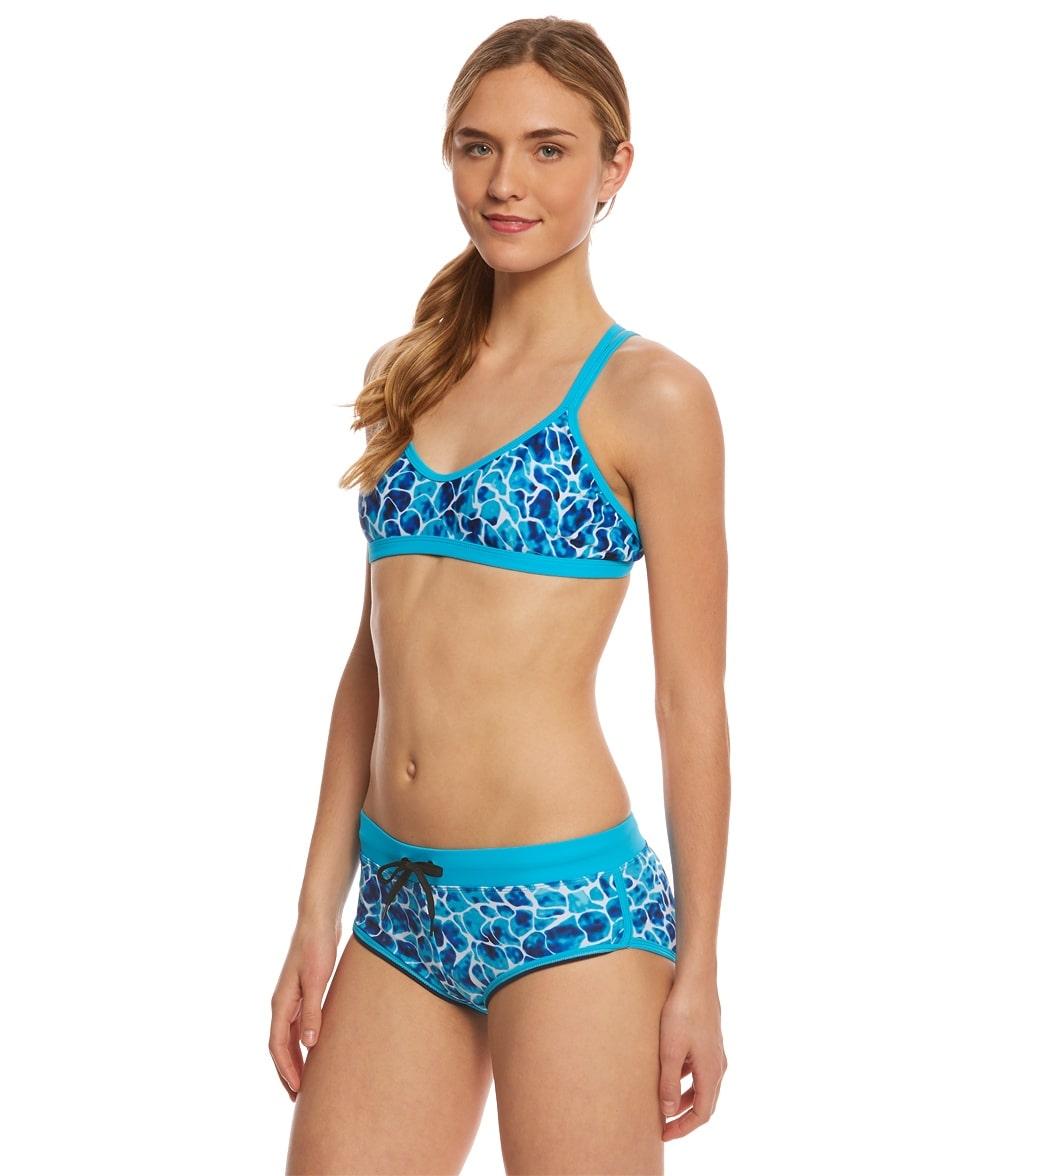 c21a0e38e4a Waterpro Women's Coral Double Strap Bikini Set at SwimOutlet.com